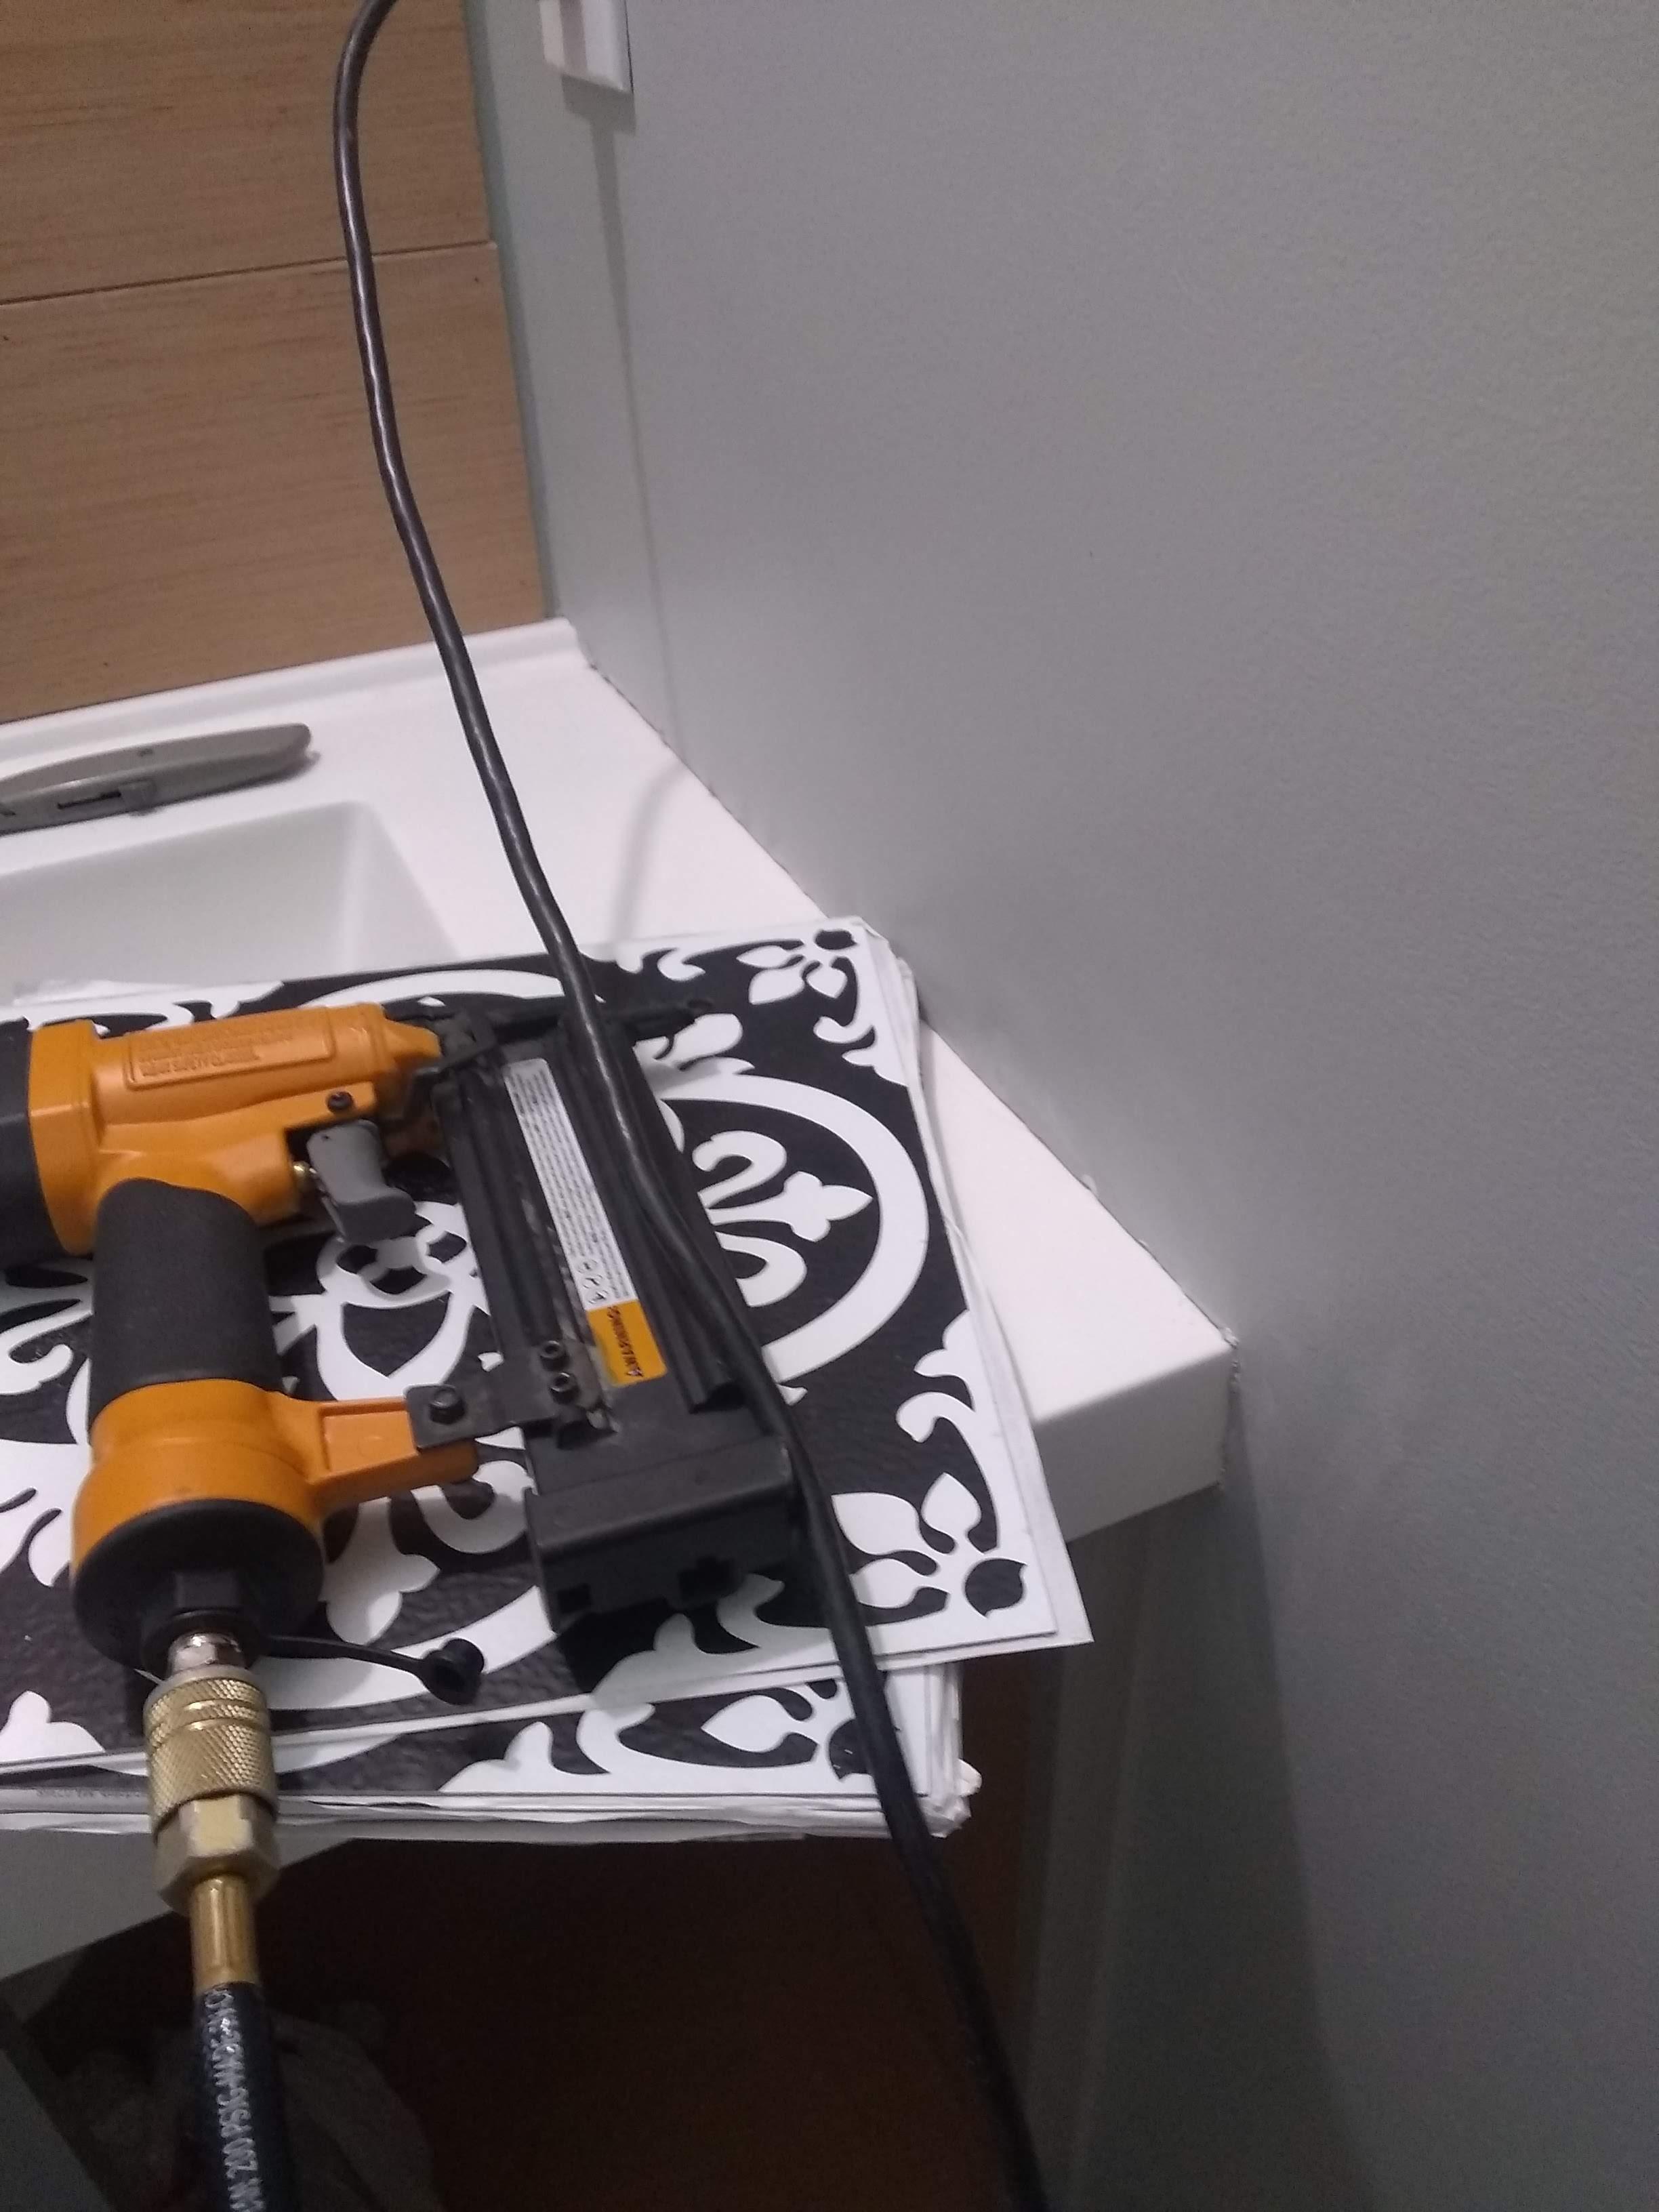 Elizabeth Burns Design | One Room Challenge Guest Bathroom Remodel on a Budget Installing a Cultured Marble Counter